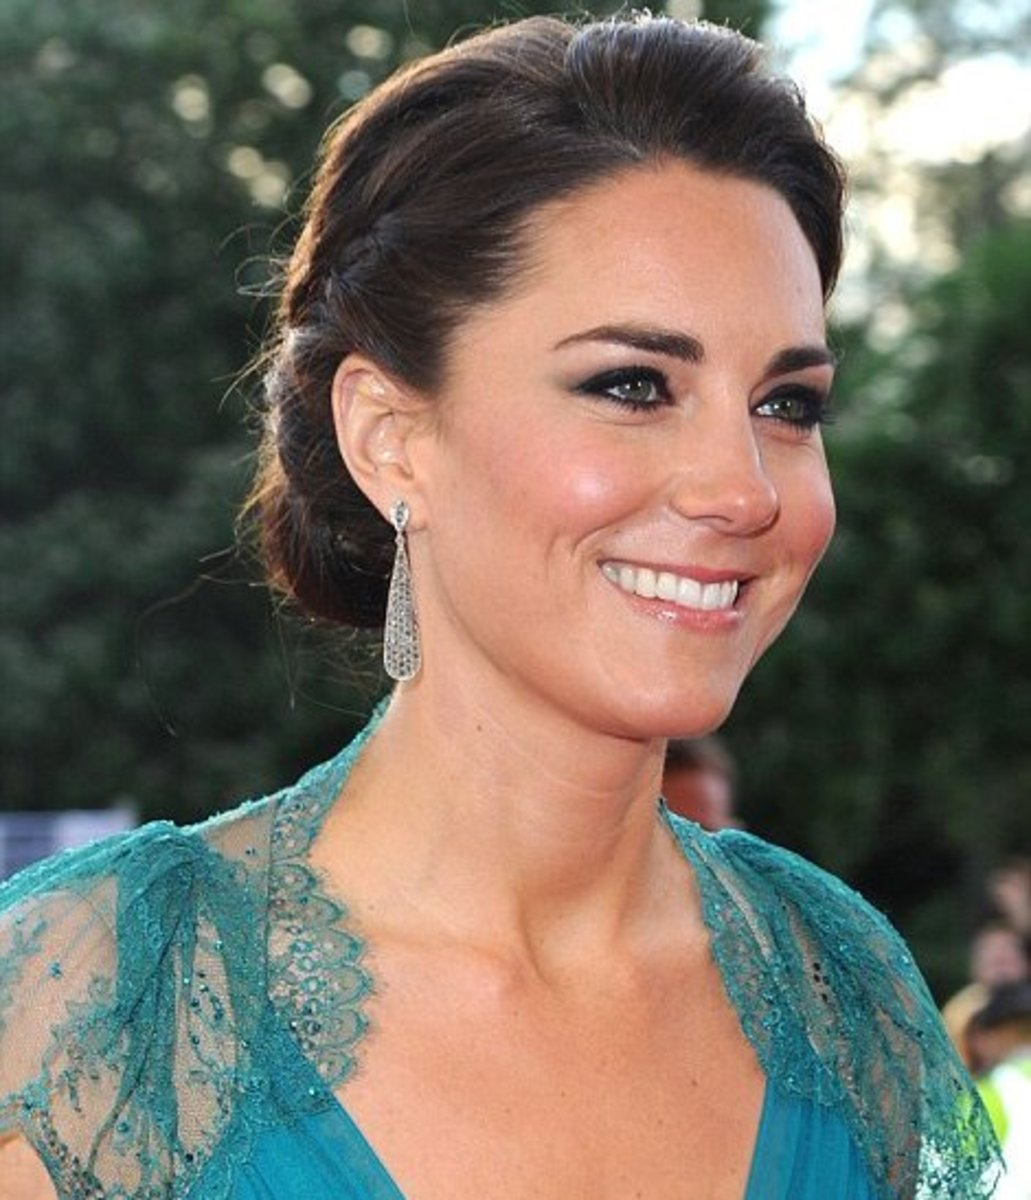 Kate Middleton's teardrop shaped earrings compliment her neckline